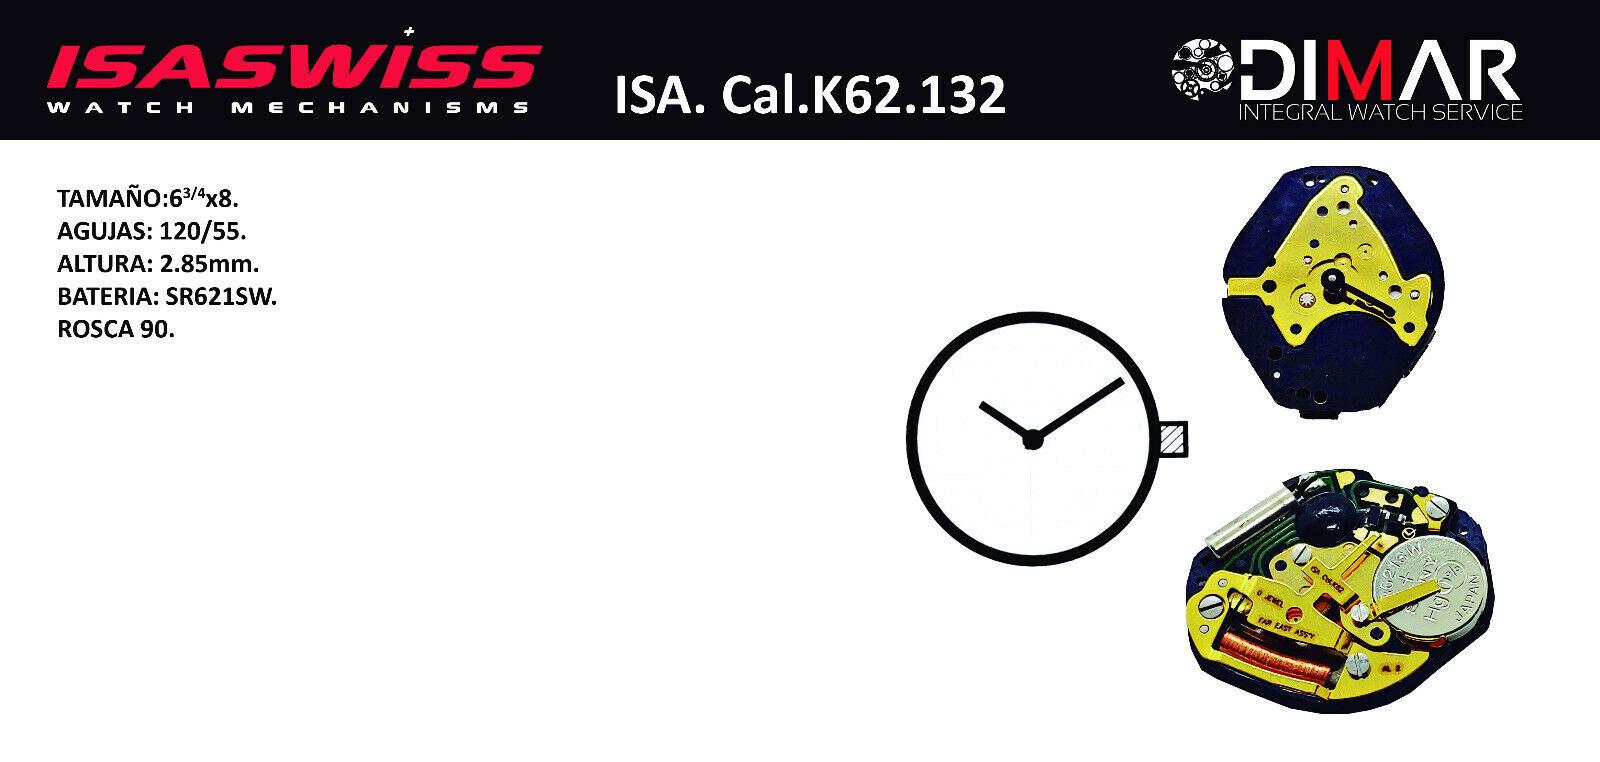 movement isa cal k62 132